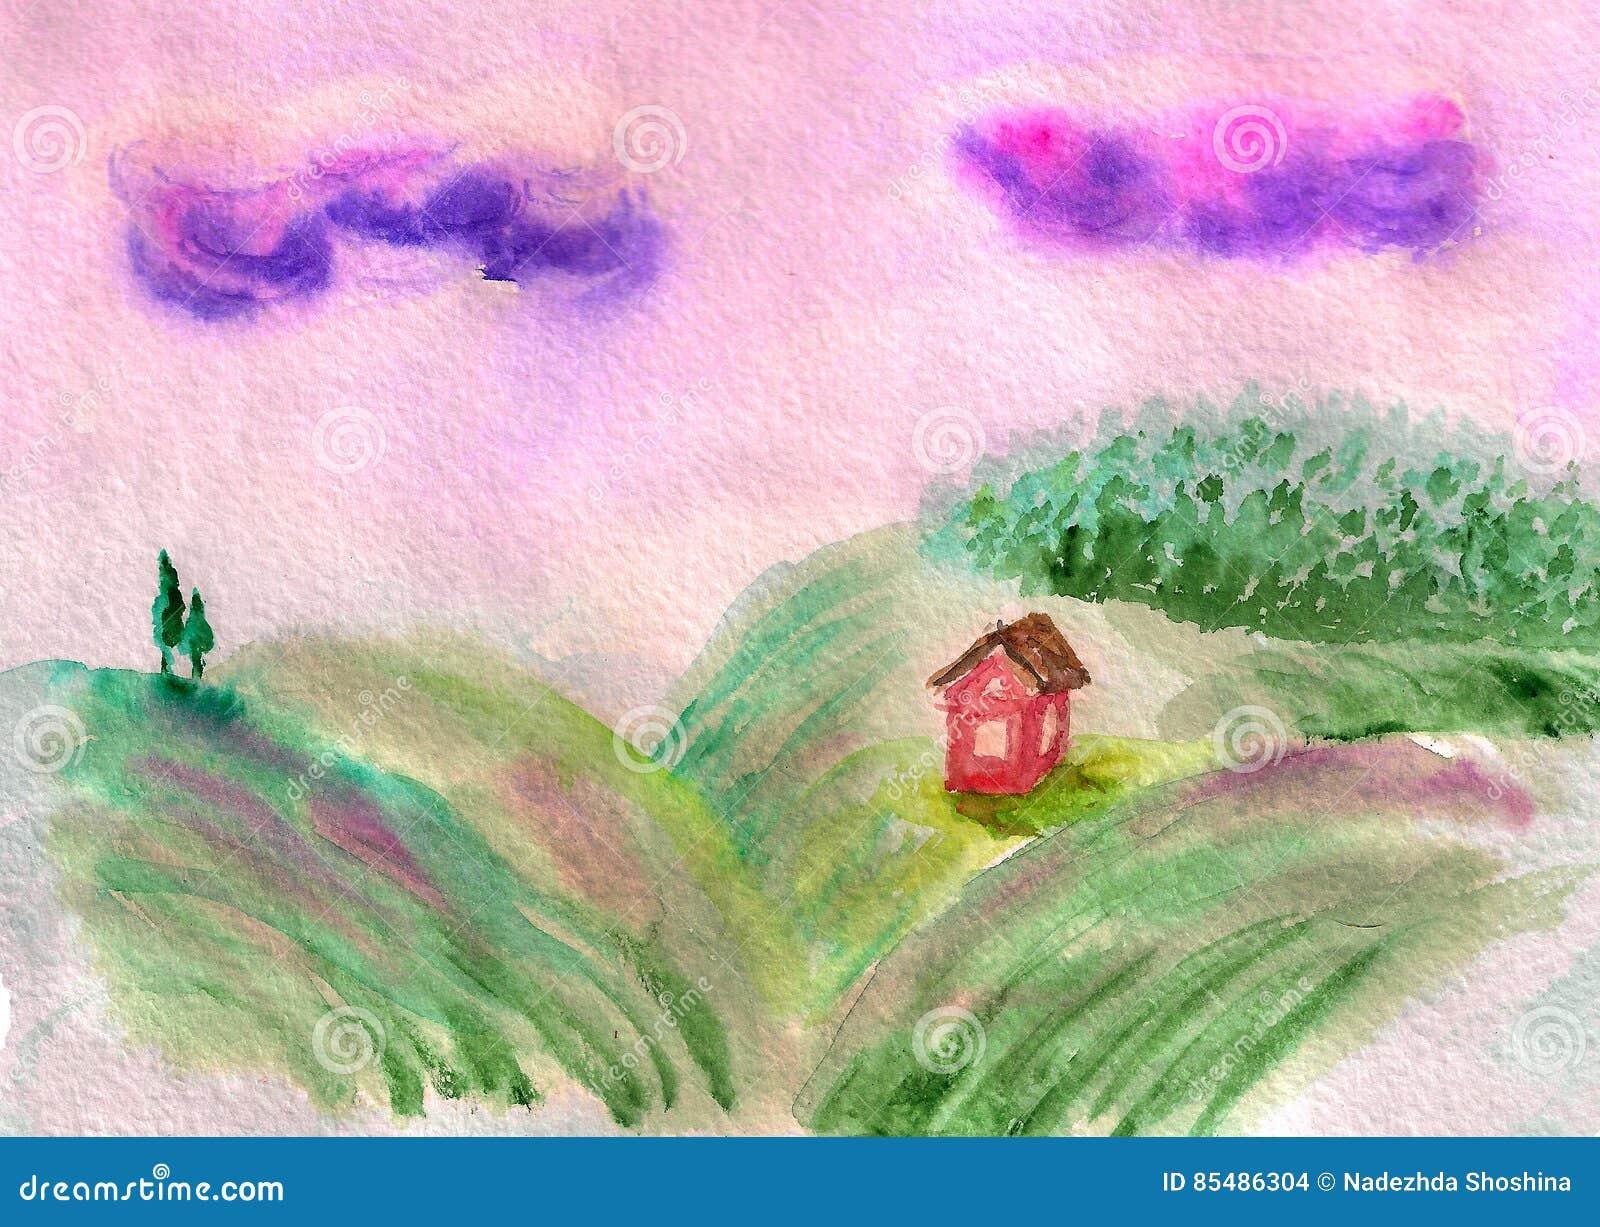 Field landscape with hills stock illustration. Illustration of ...